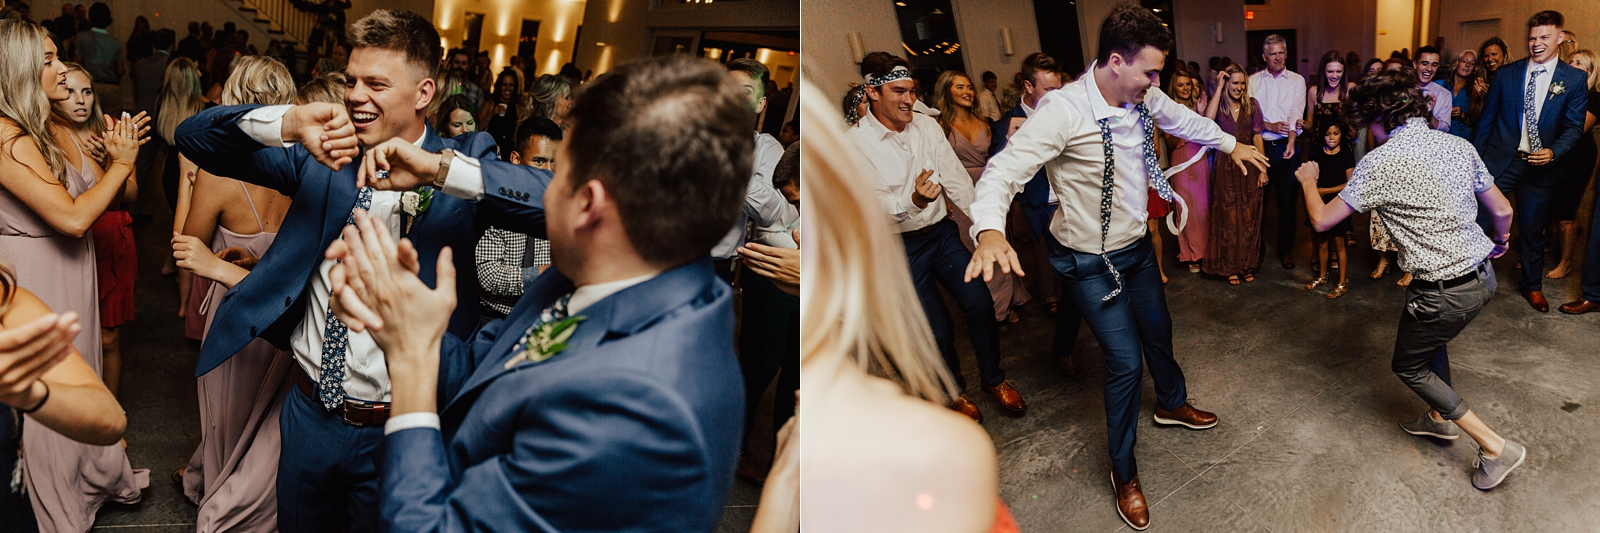 Anna & Trey Modern Minneapolis Wedding at The Hutton House_0745.jpg